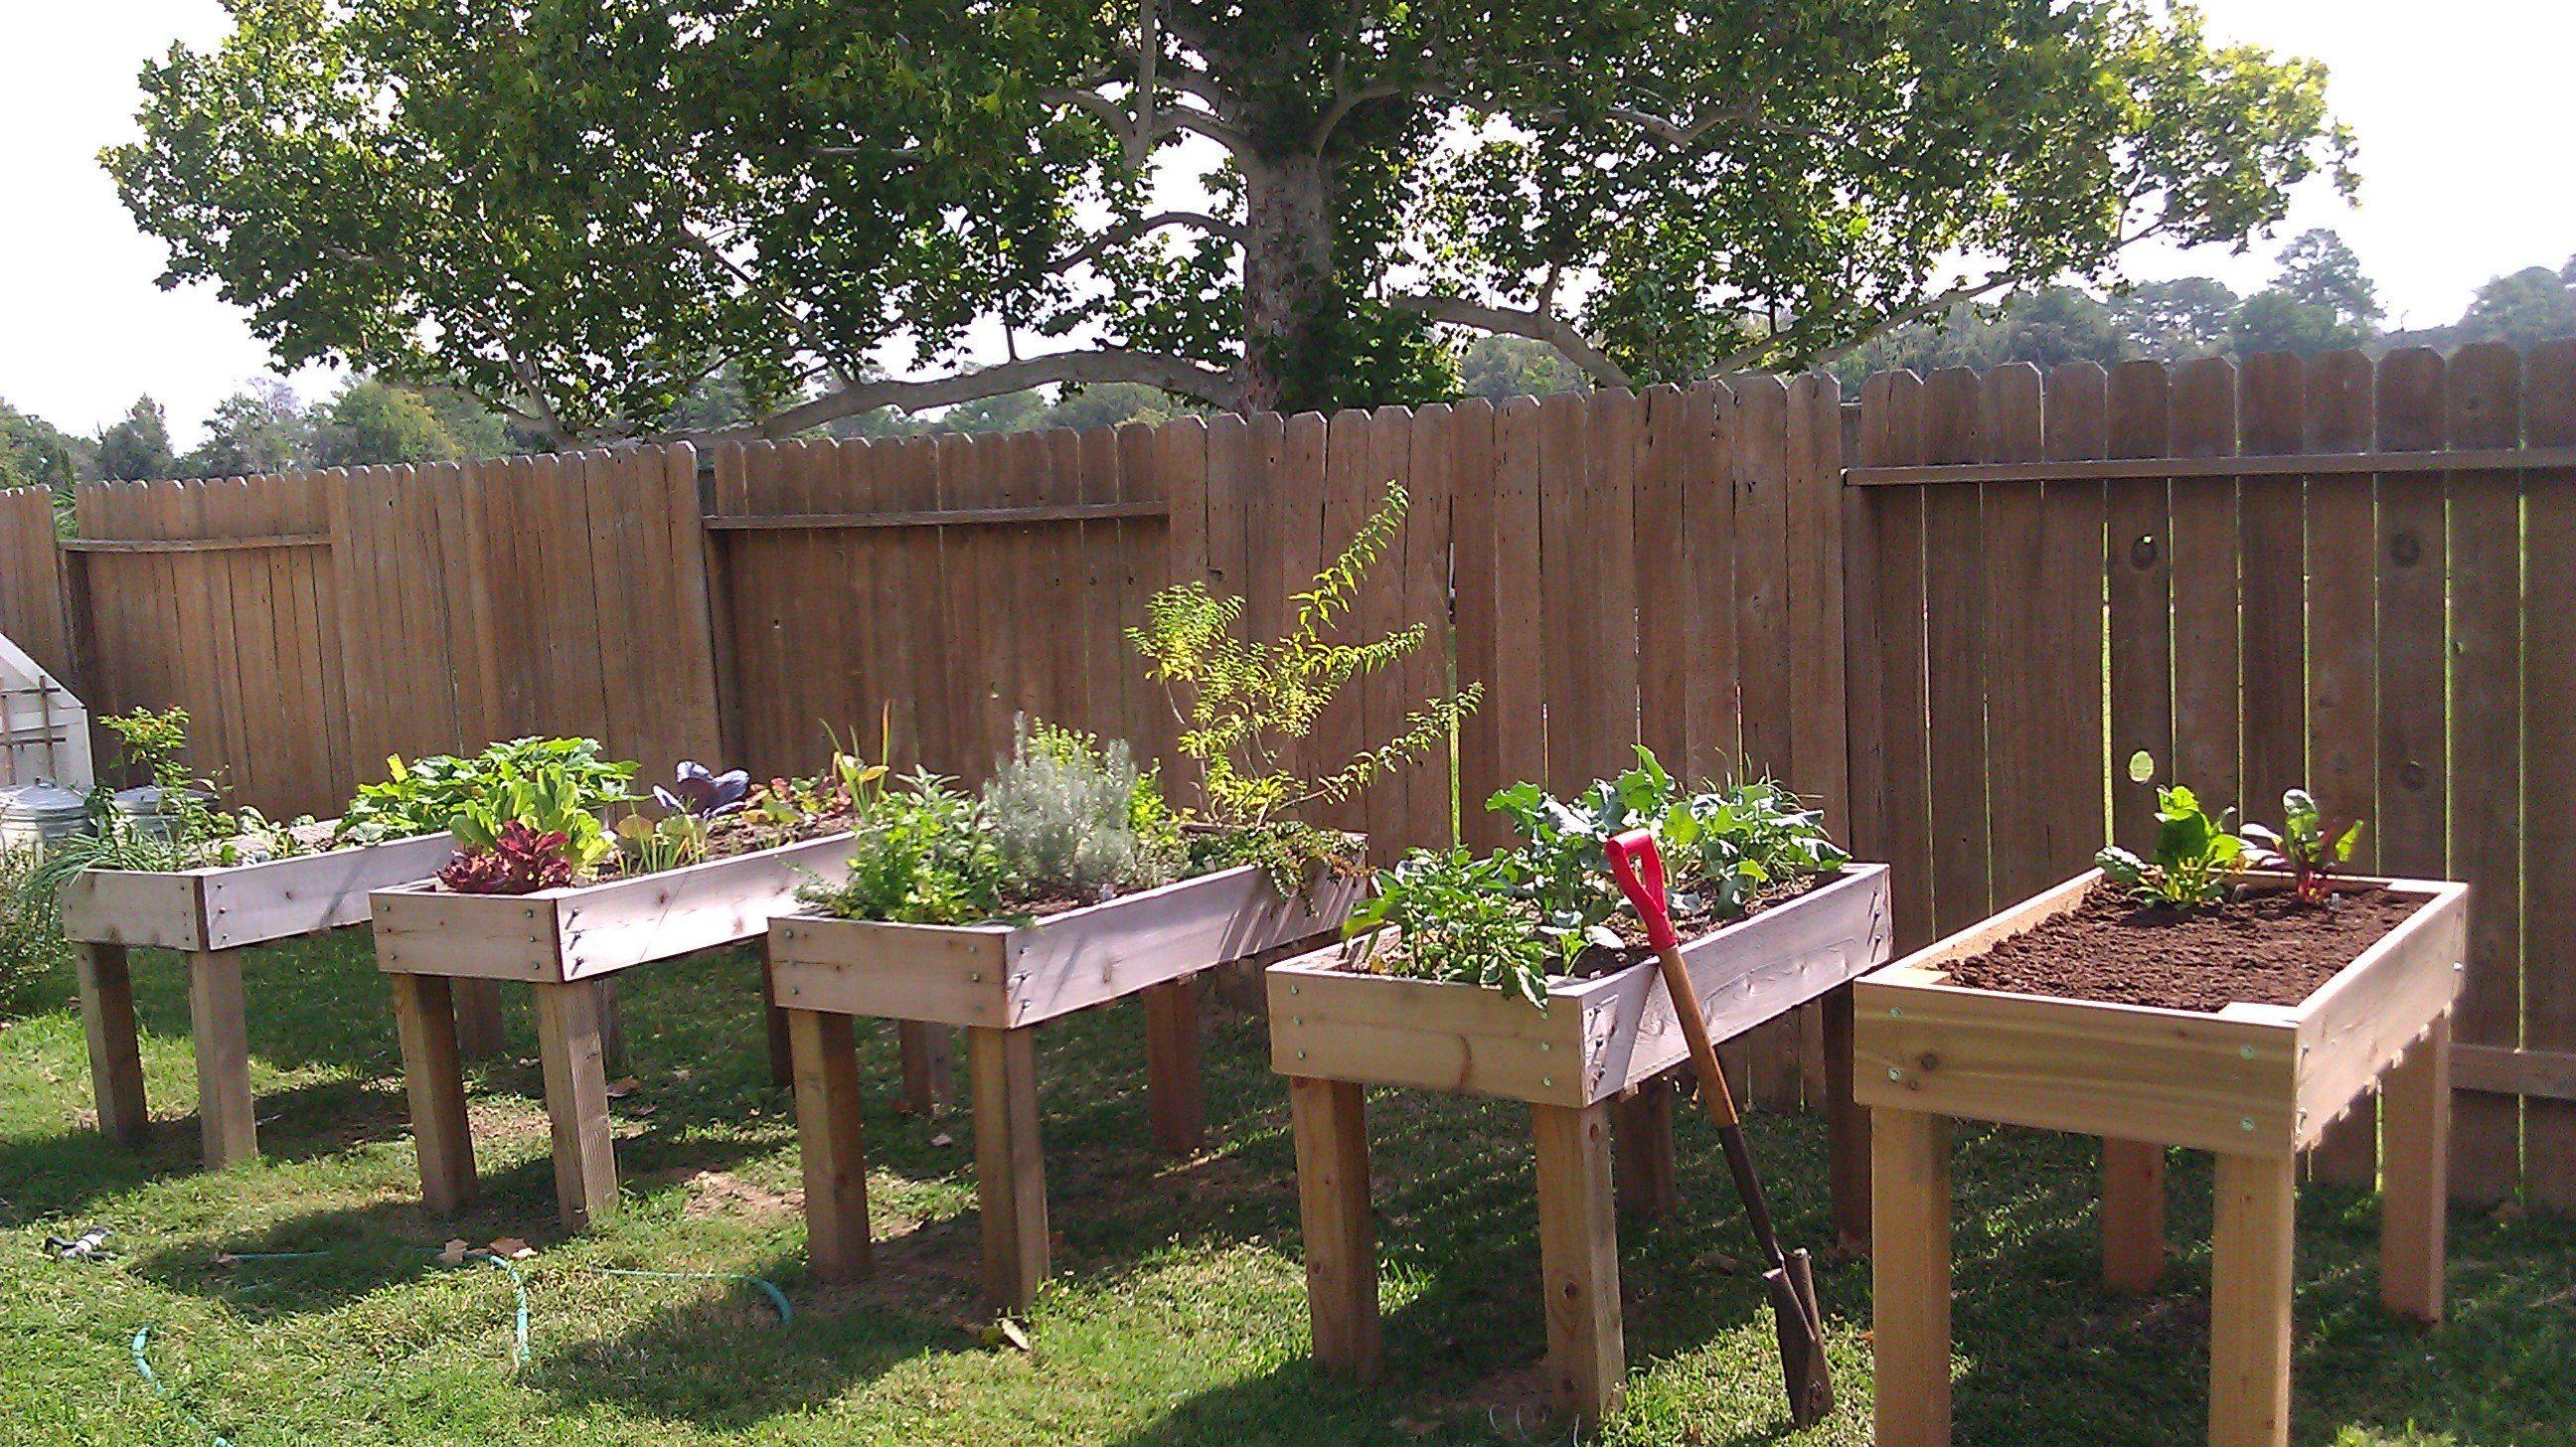 Creative Diy Backyard Vegetable Garden House Design Using Pallet Wood For Raised Bed Garden Pla Diy Raised Garden Garden Planter Boxes Raised Vegetable Gardens